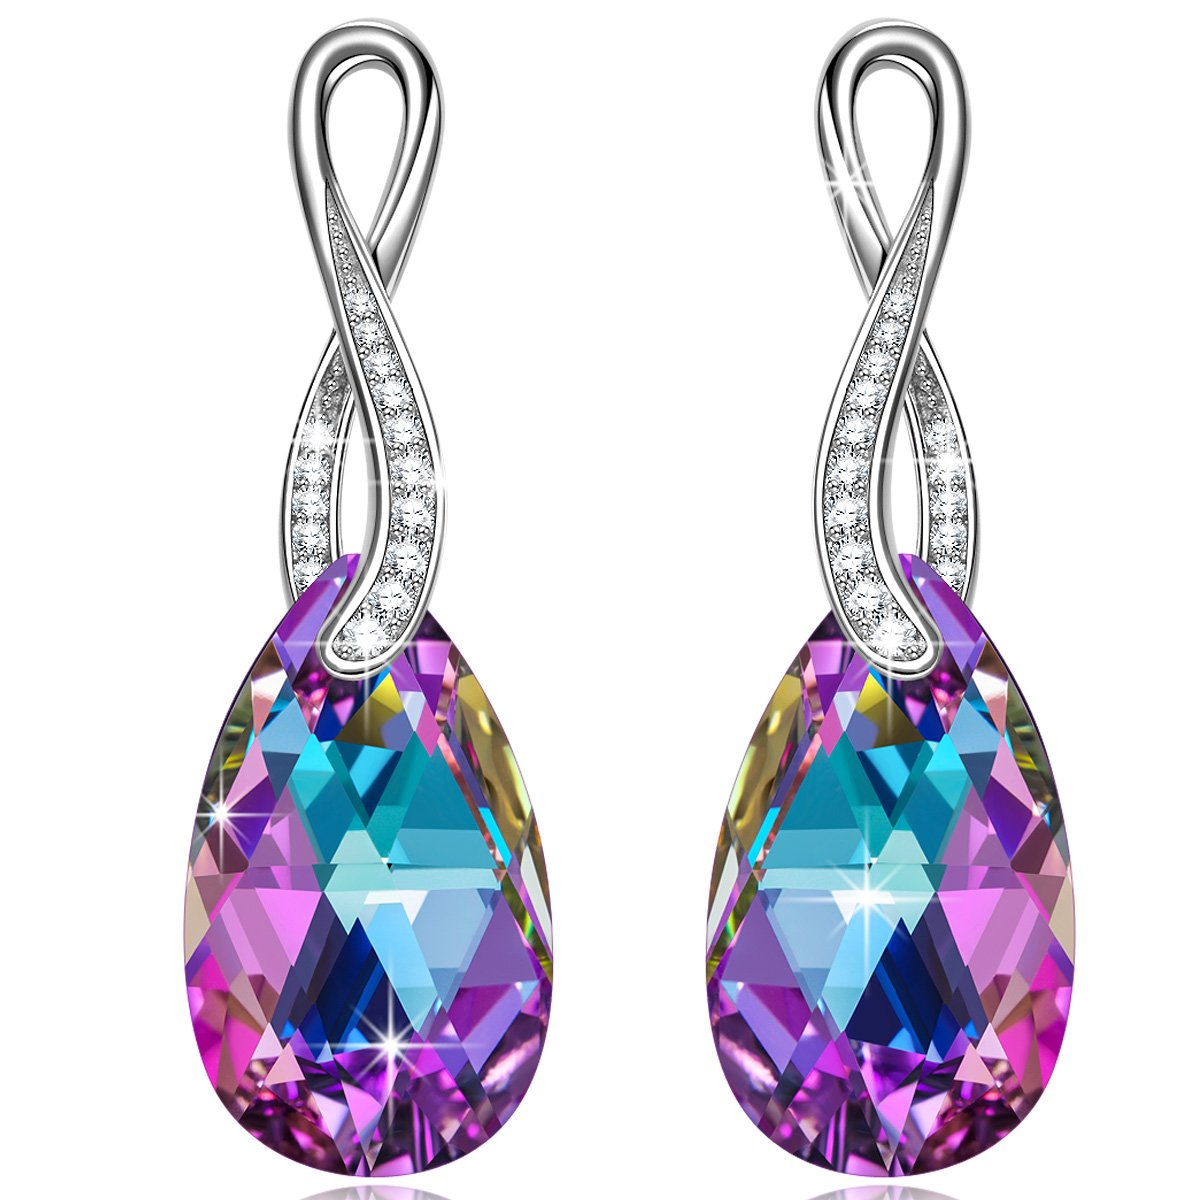 Alex Perry Amor Provenza Plata de Ley Fabricados con Vitrail Light Cristales